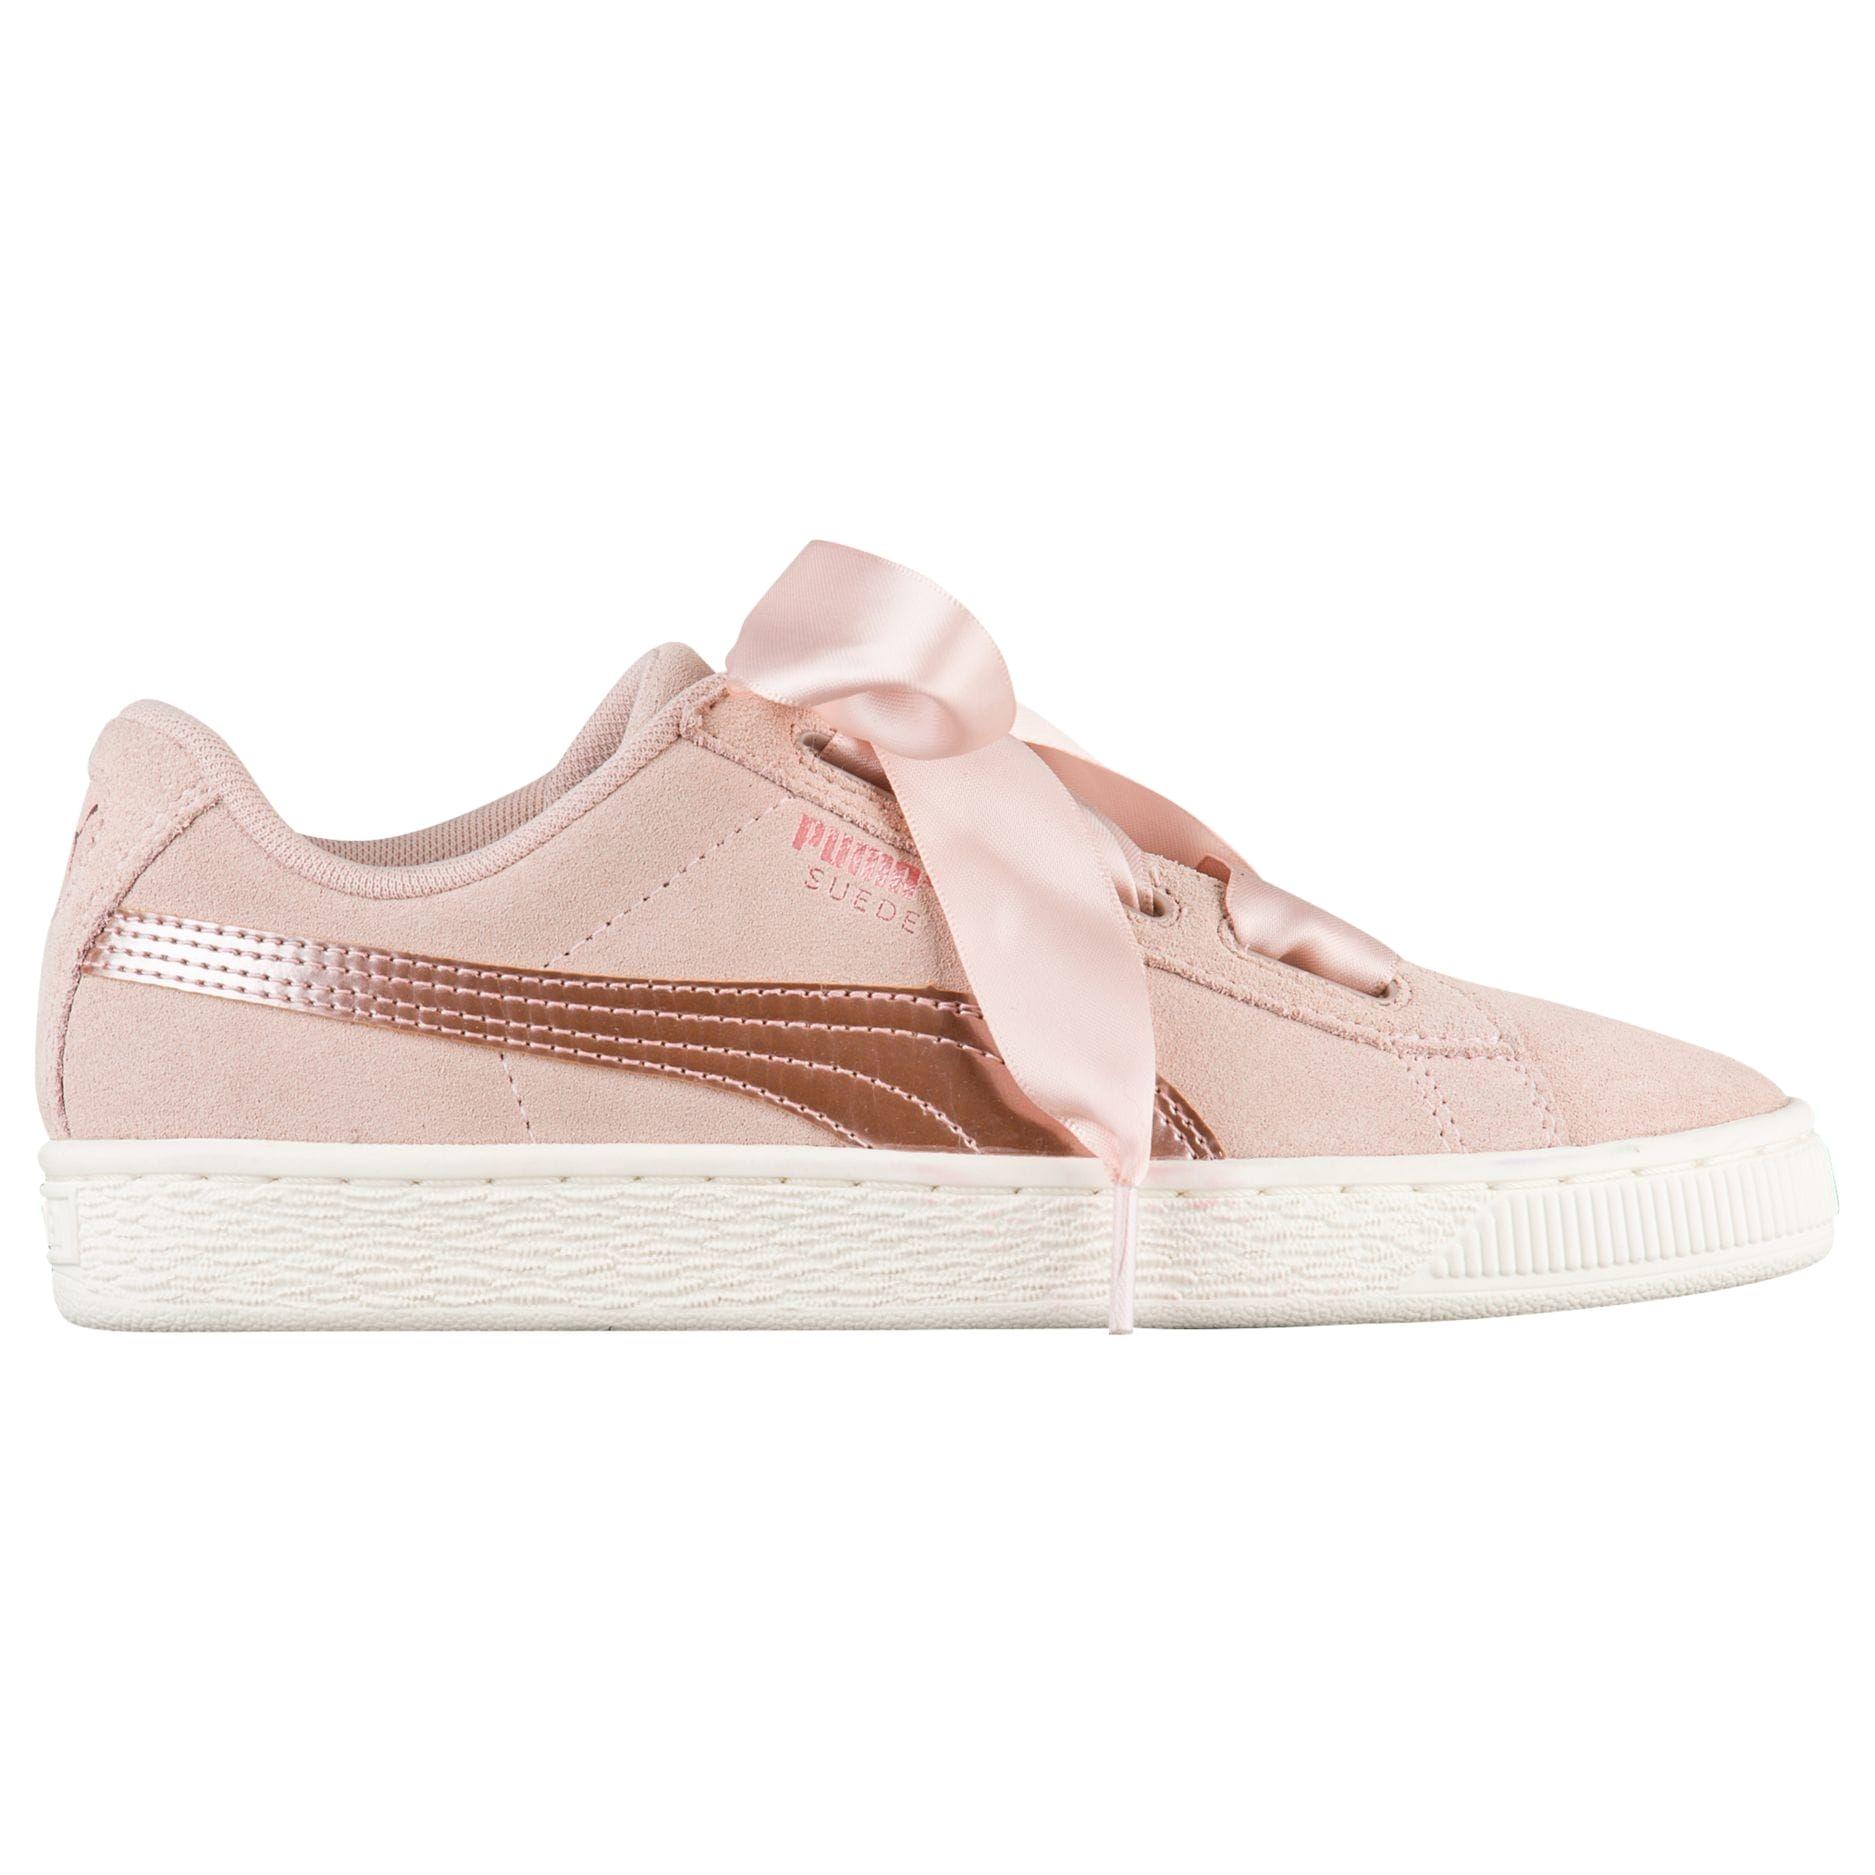 puma suede heart girls grade school basketball shoes rose gold